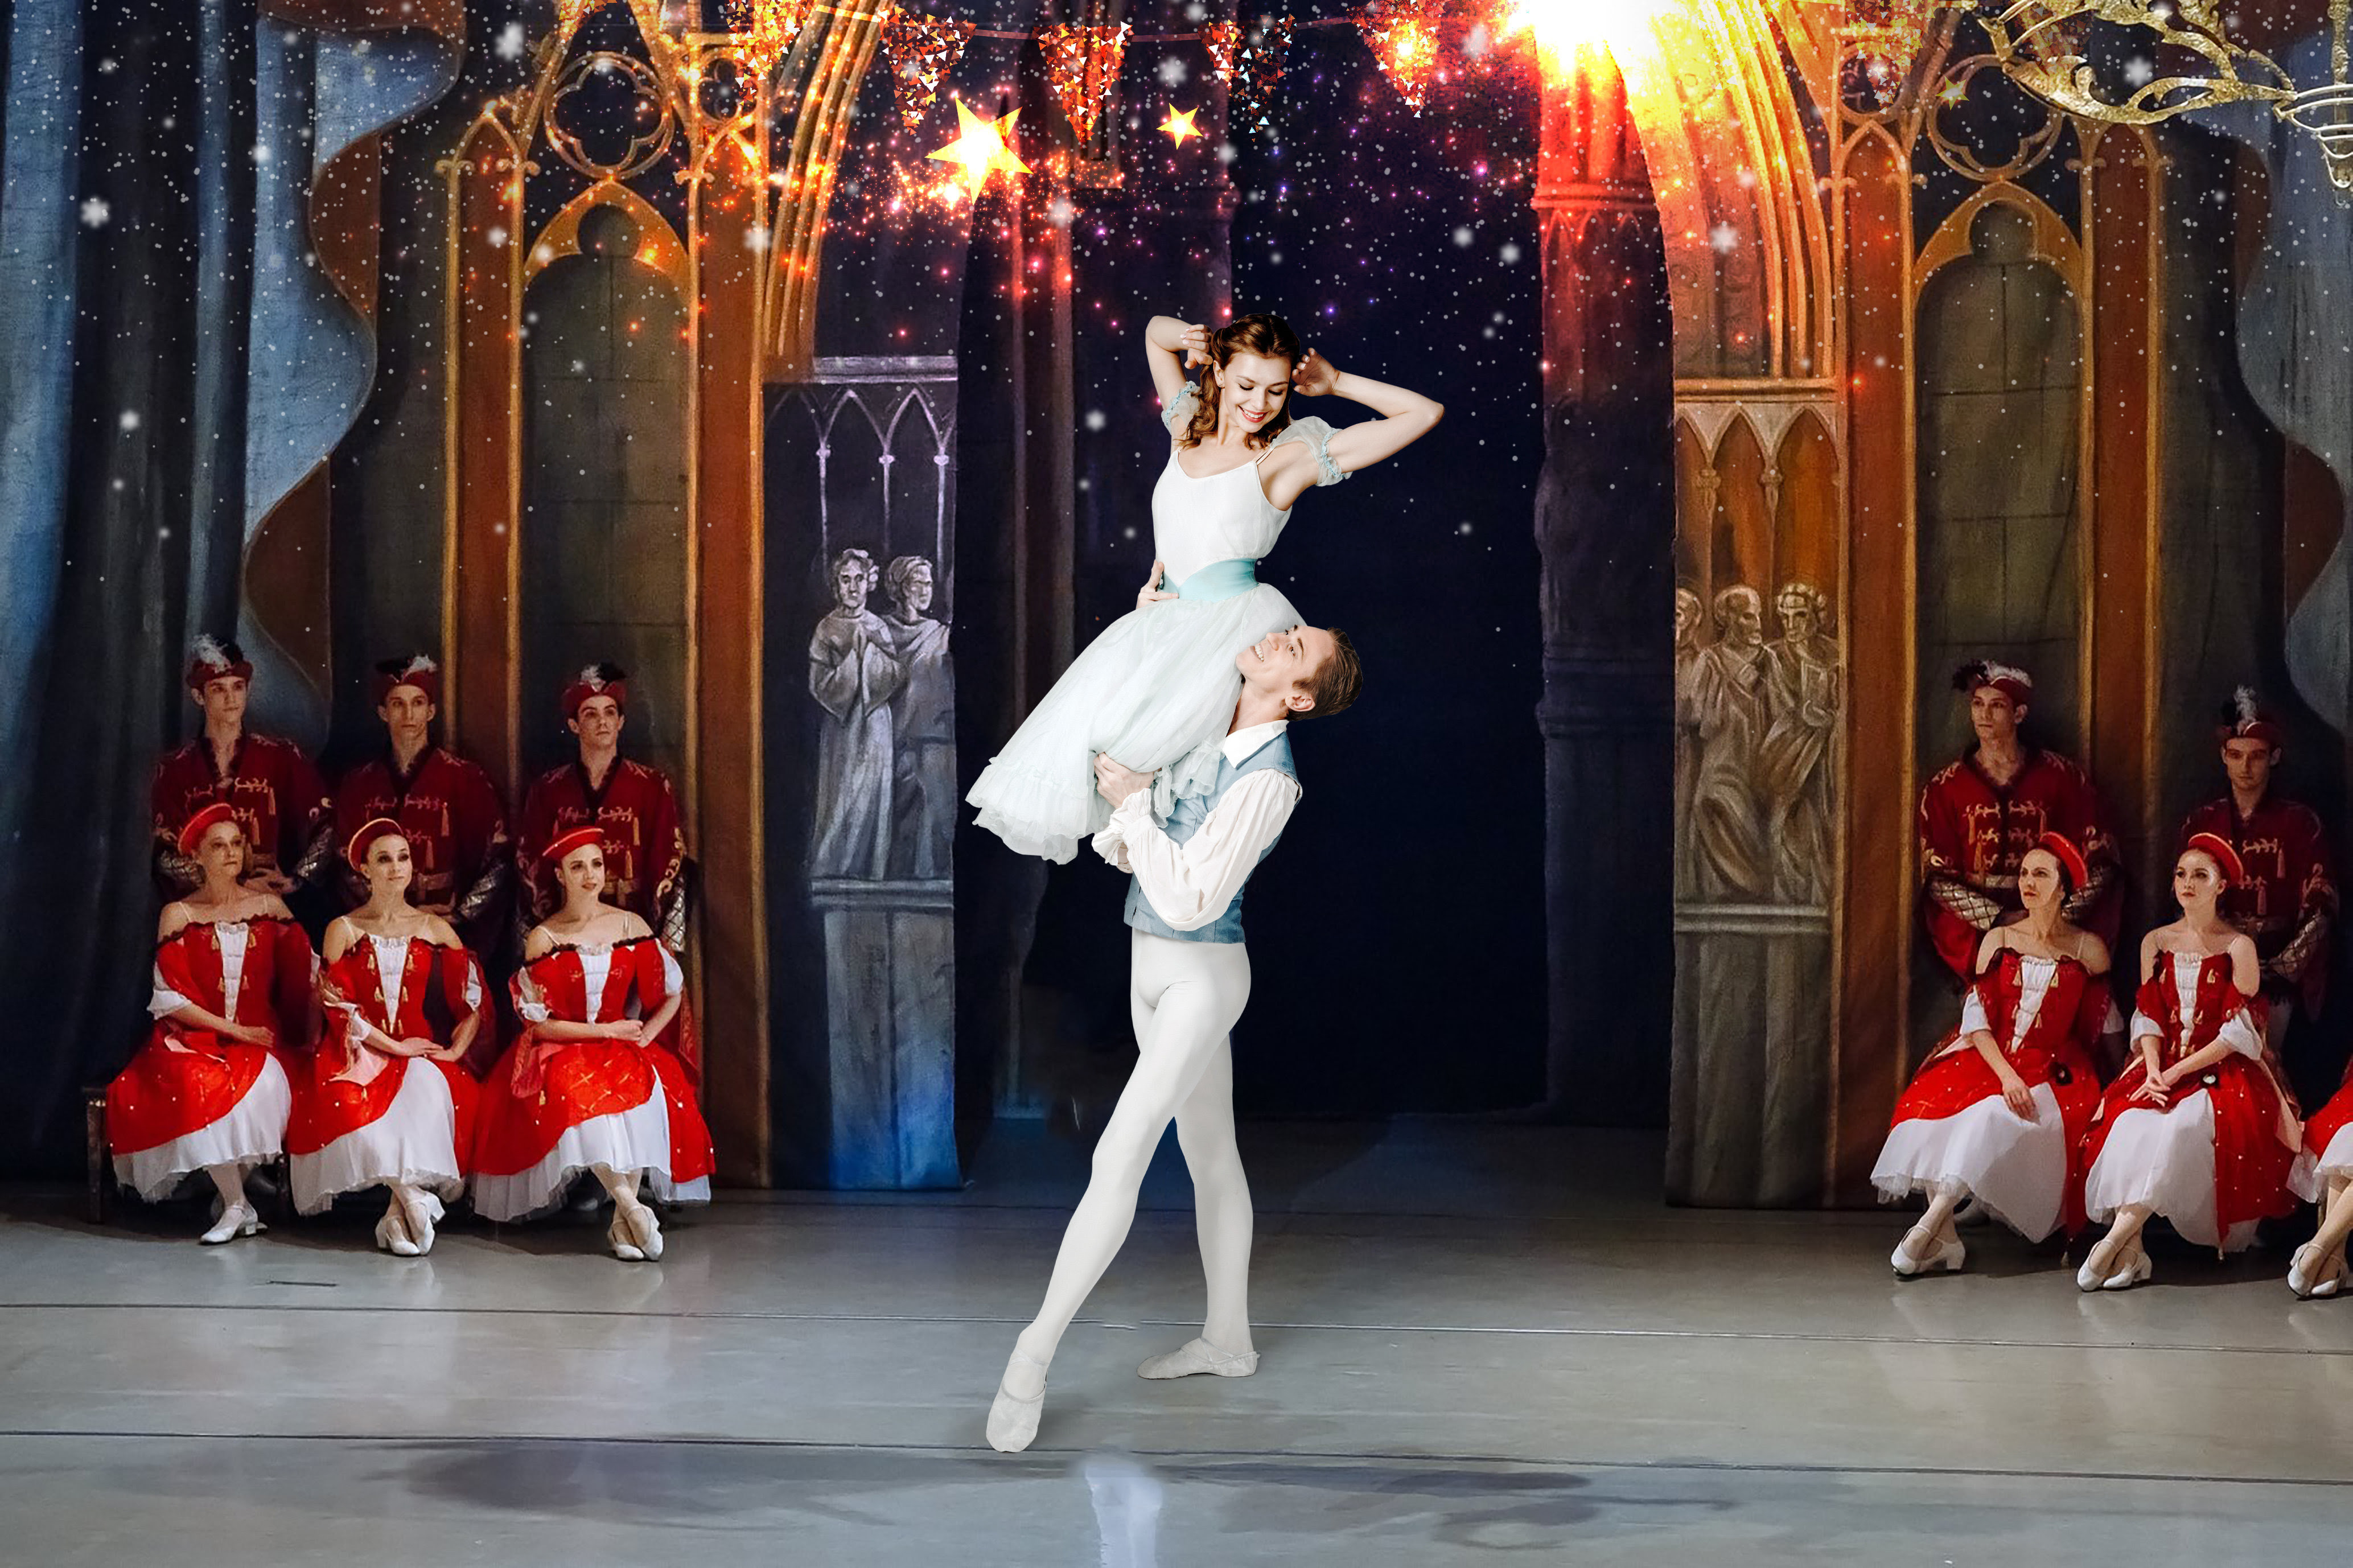 5aff748ae7f djk Music Channel: Καρυοθραύστης: Ζήστε την μαγεία του κλασικού μπαλέτου με ζωντανή  ορχήστρα